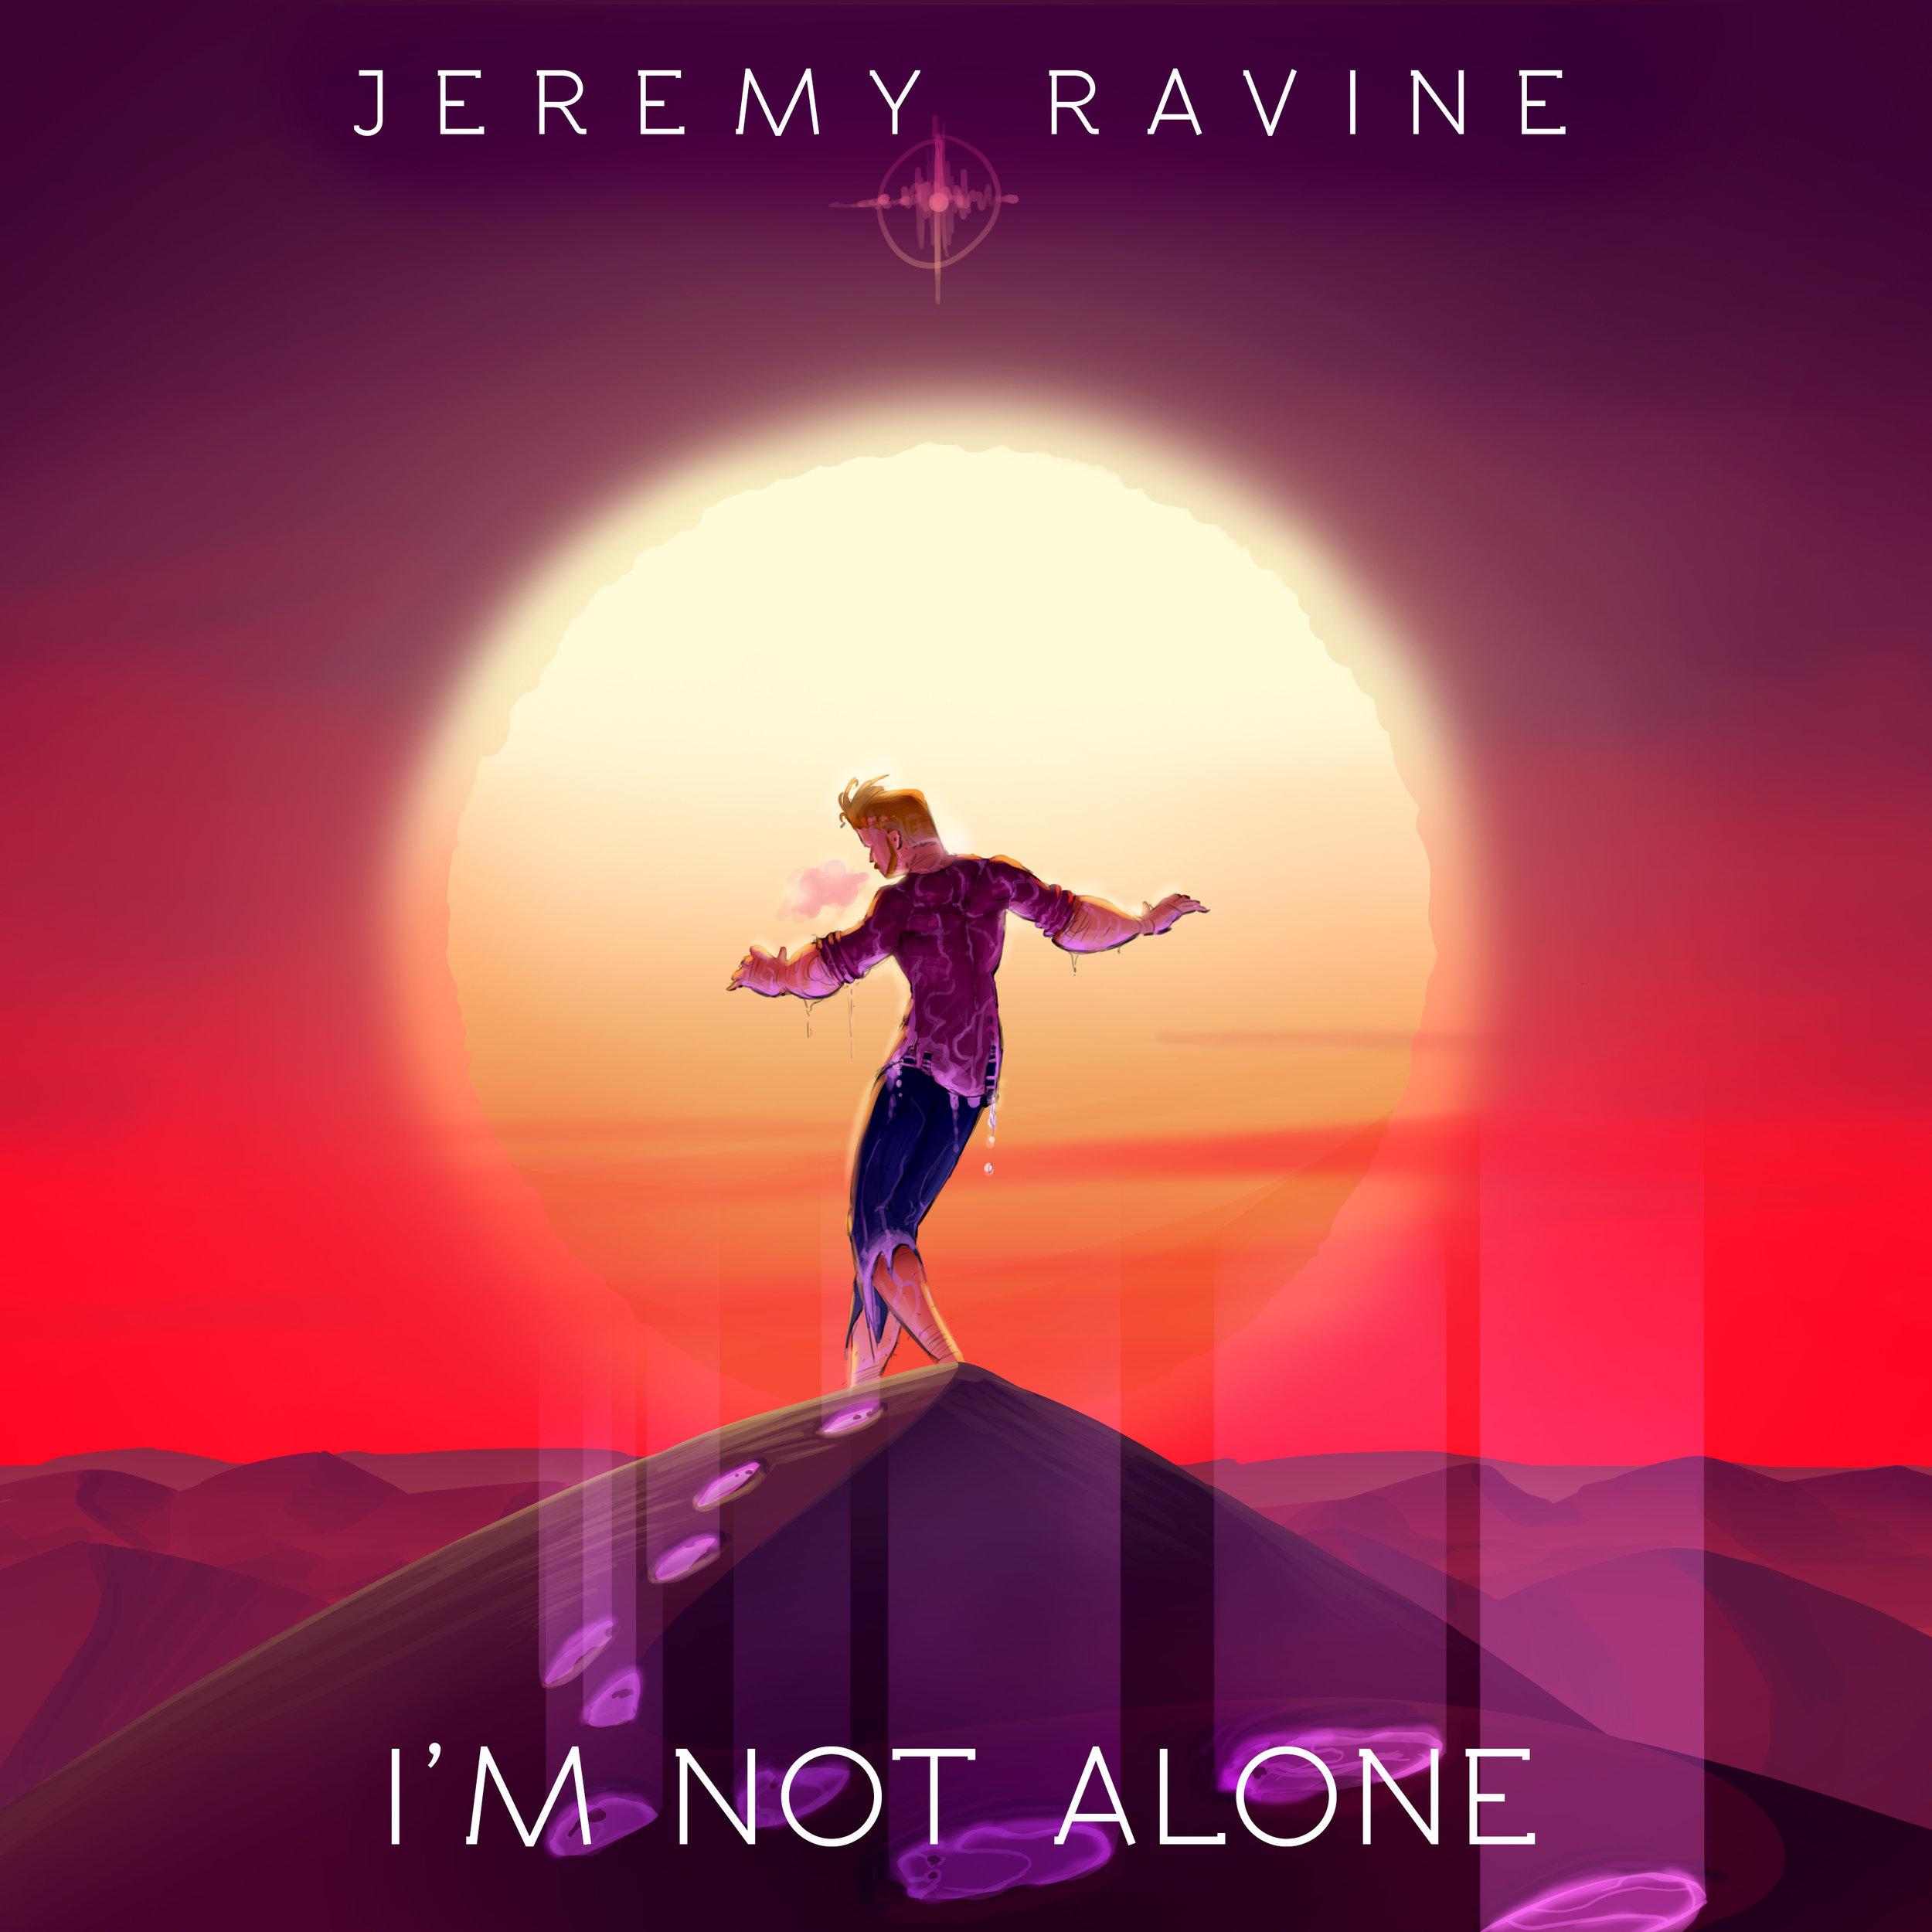 I'm-Not-Alone-3300p.jpg